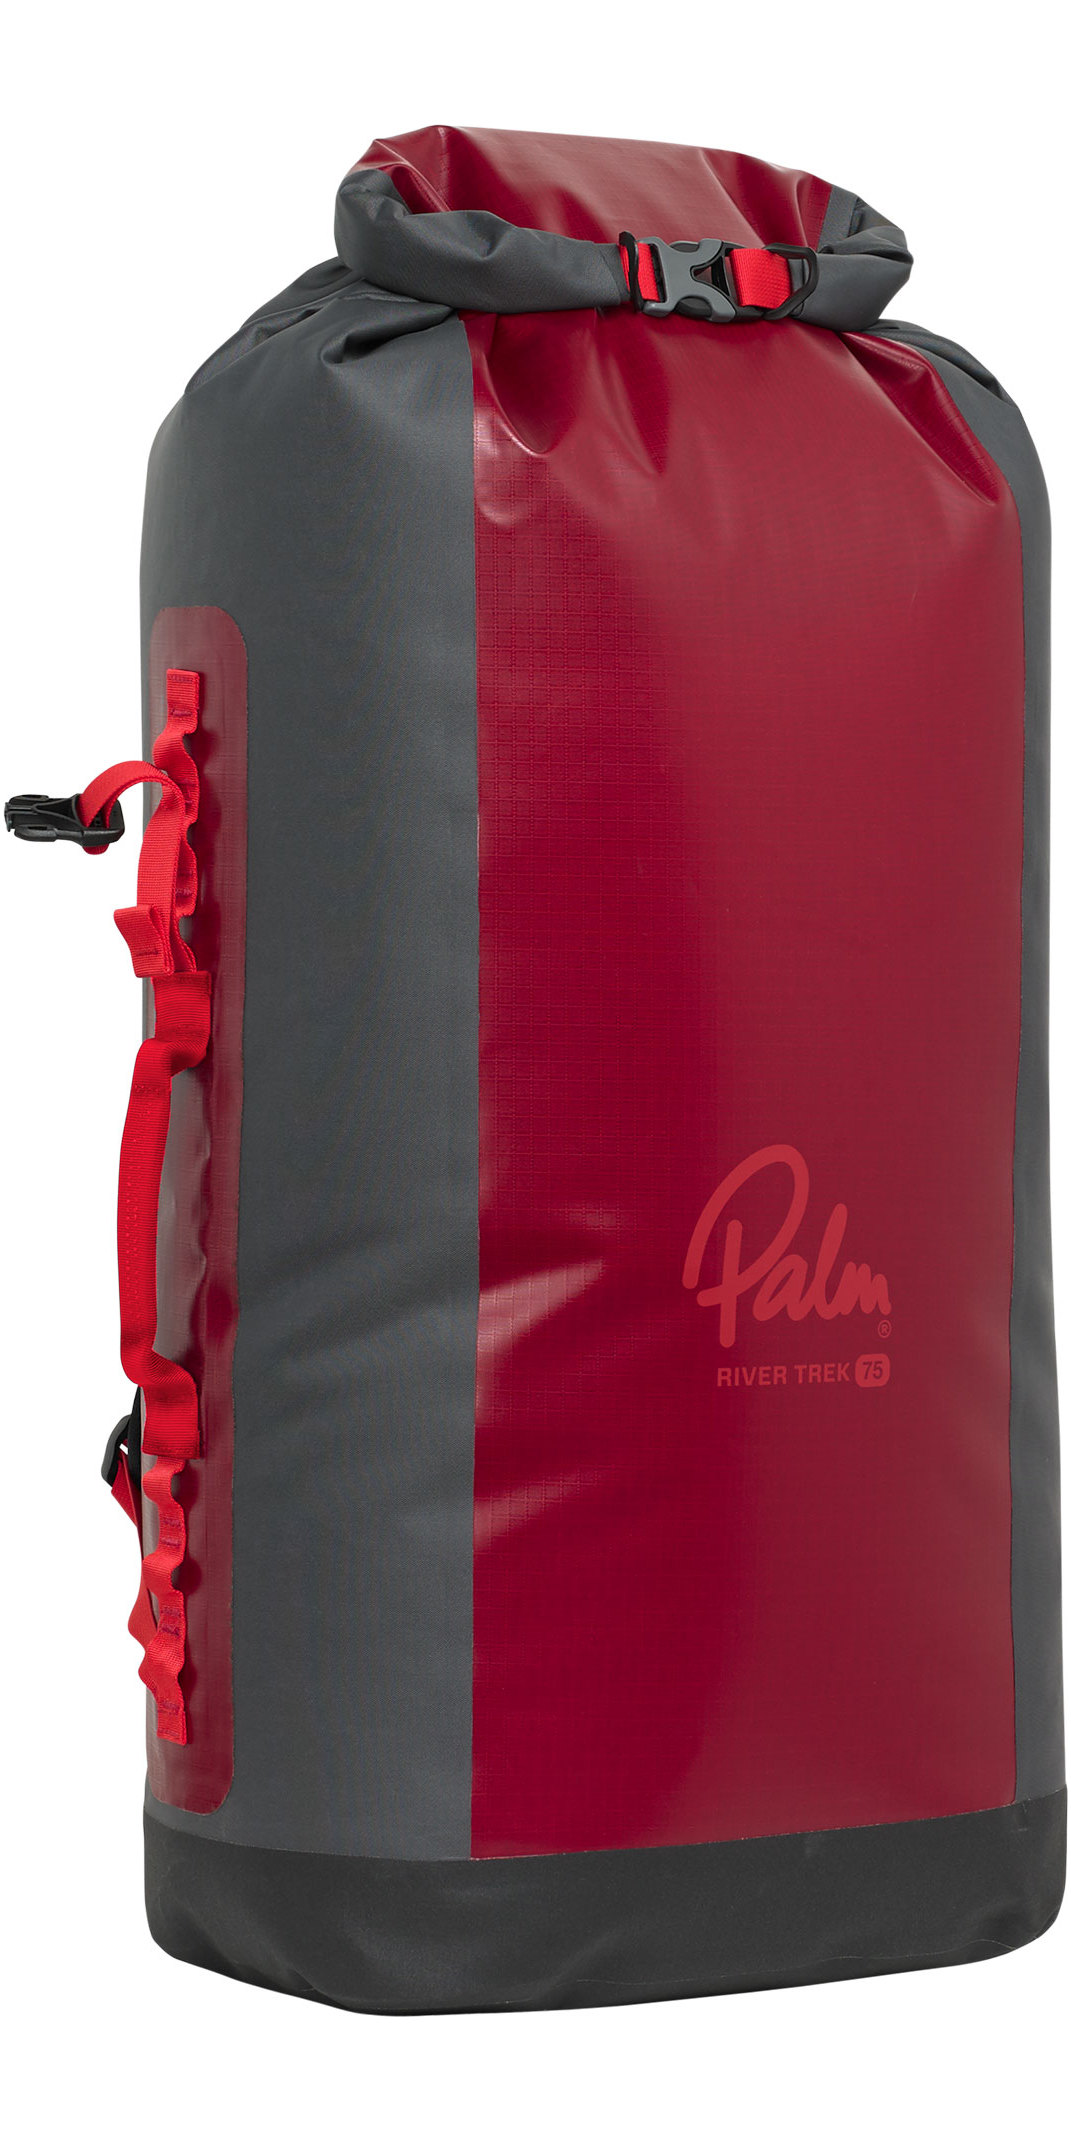 Palm-River-Trek-75L-Dry-Back-Pack-12348---Chilli-Jet-Grey.jpg